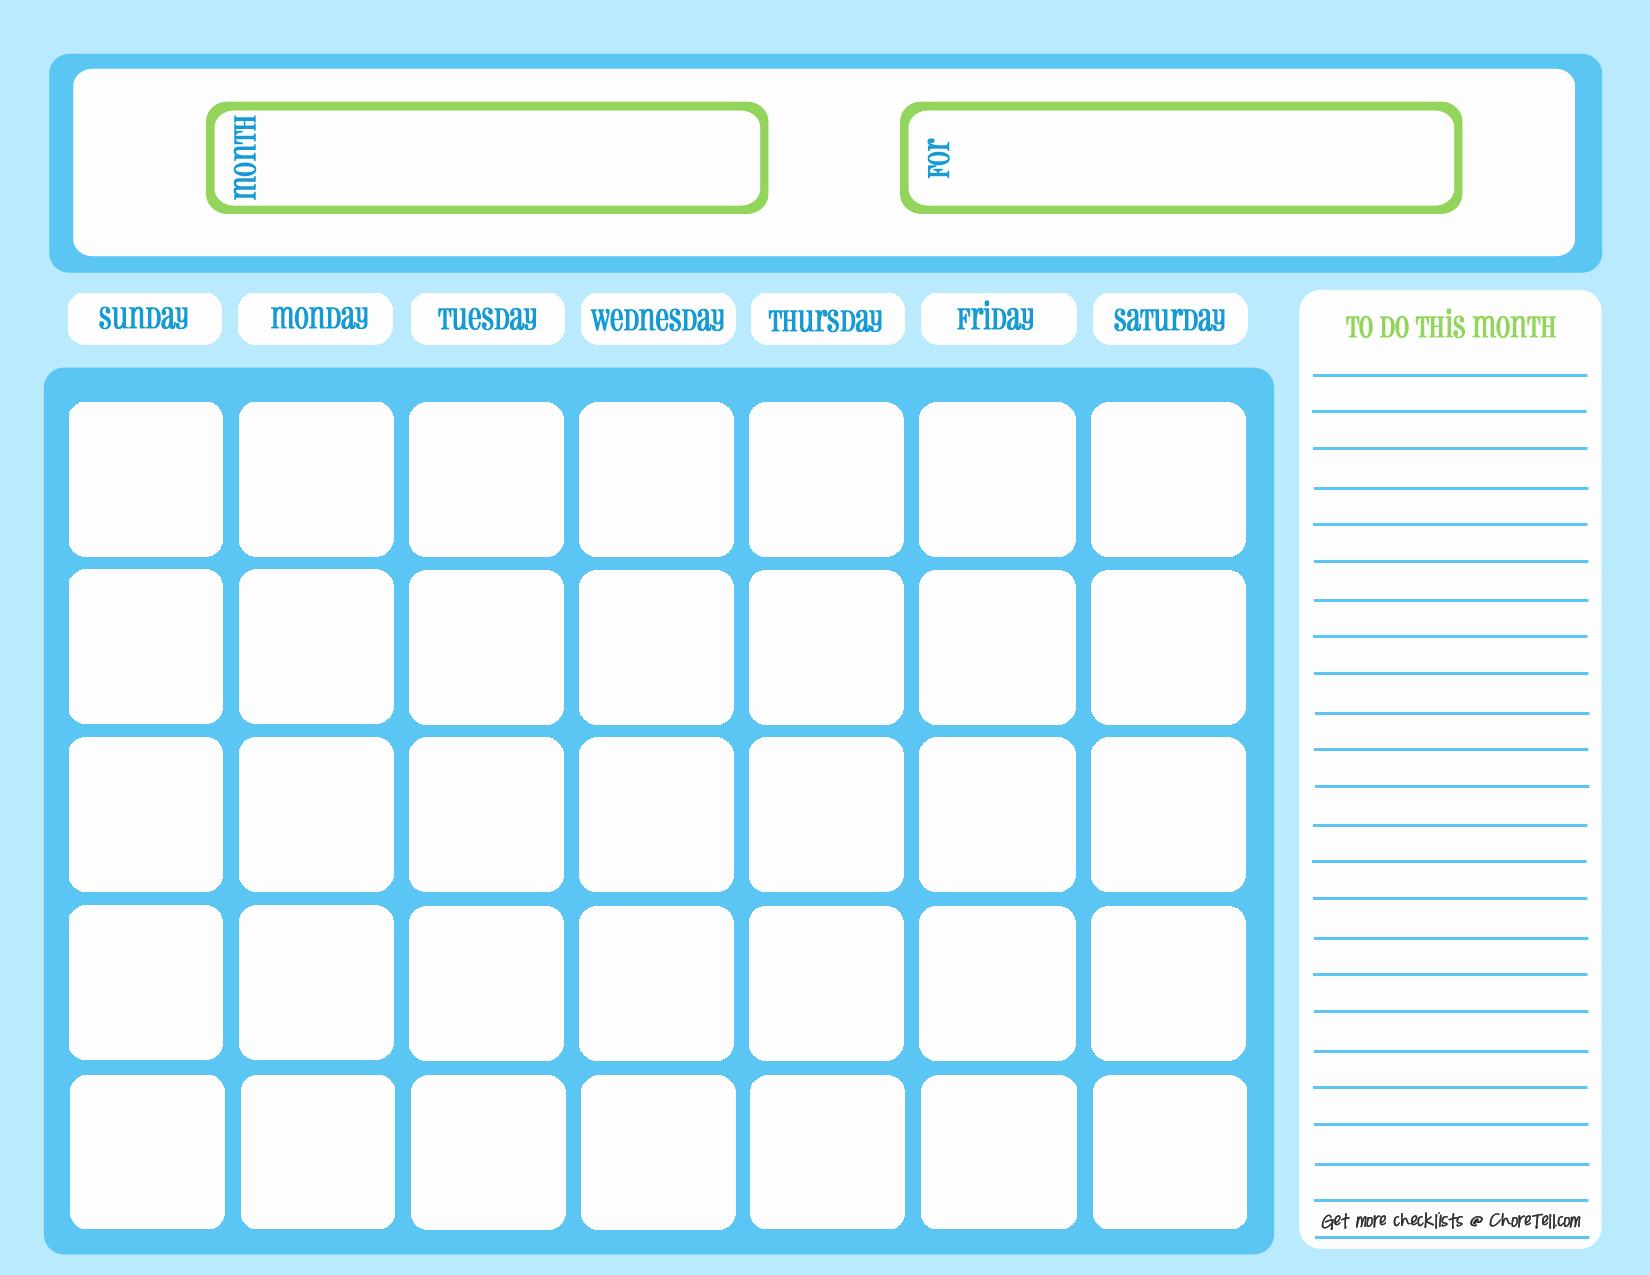 Monthly Chore Chart Template Lovely Blank Chore Calendar Blue On Light Blue